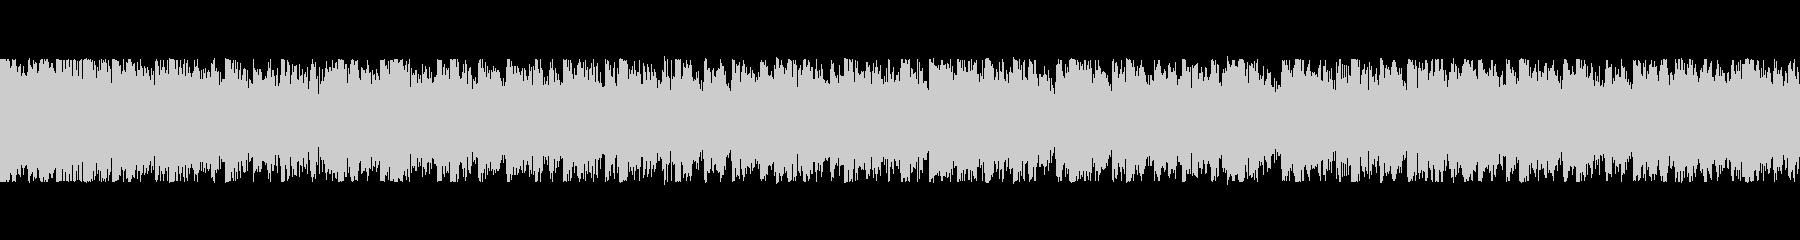 bpm127幻想的なテクノの未再生の波形